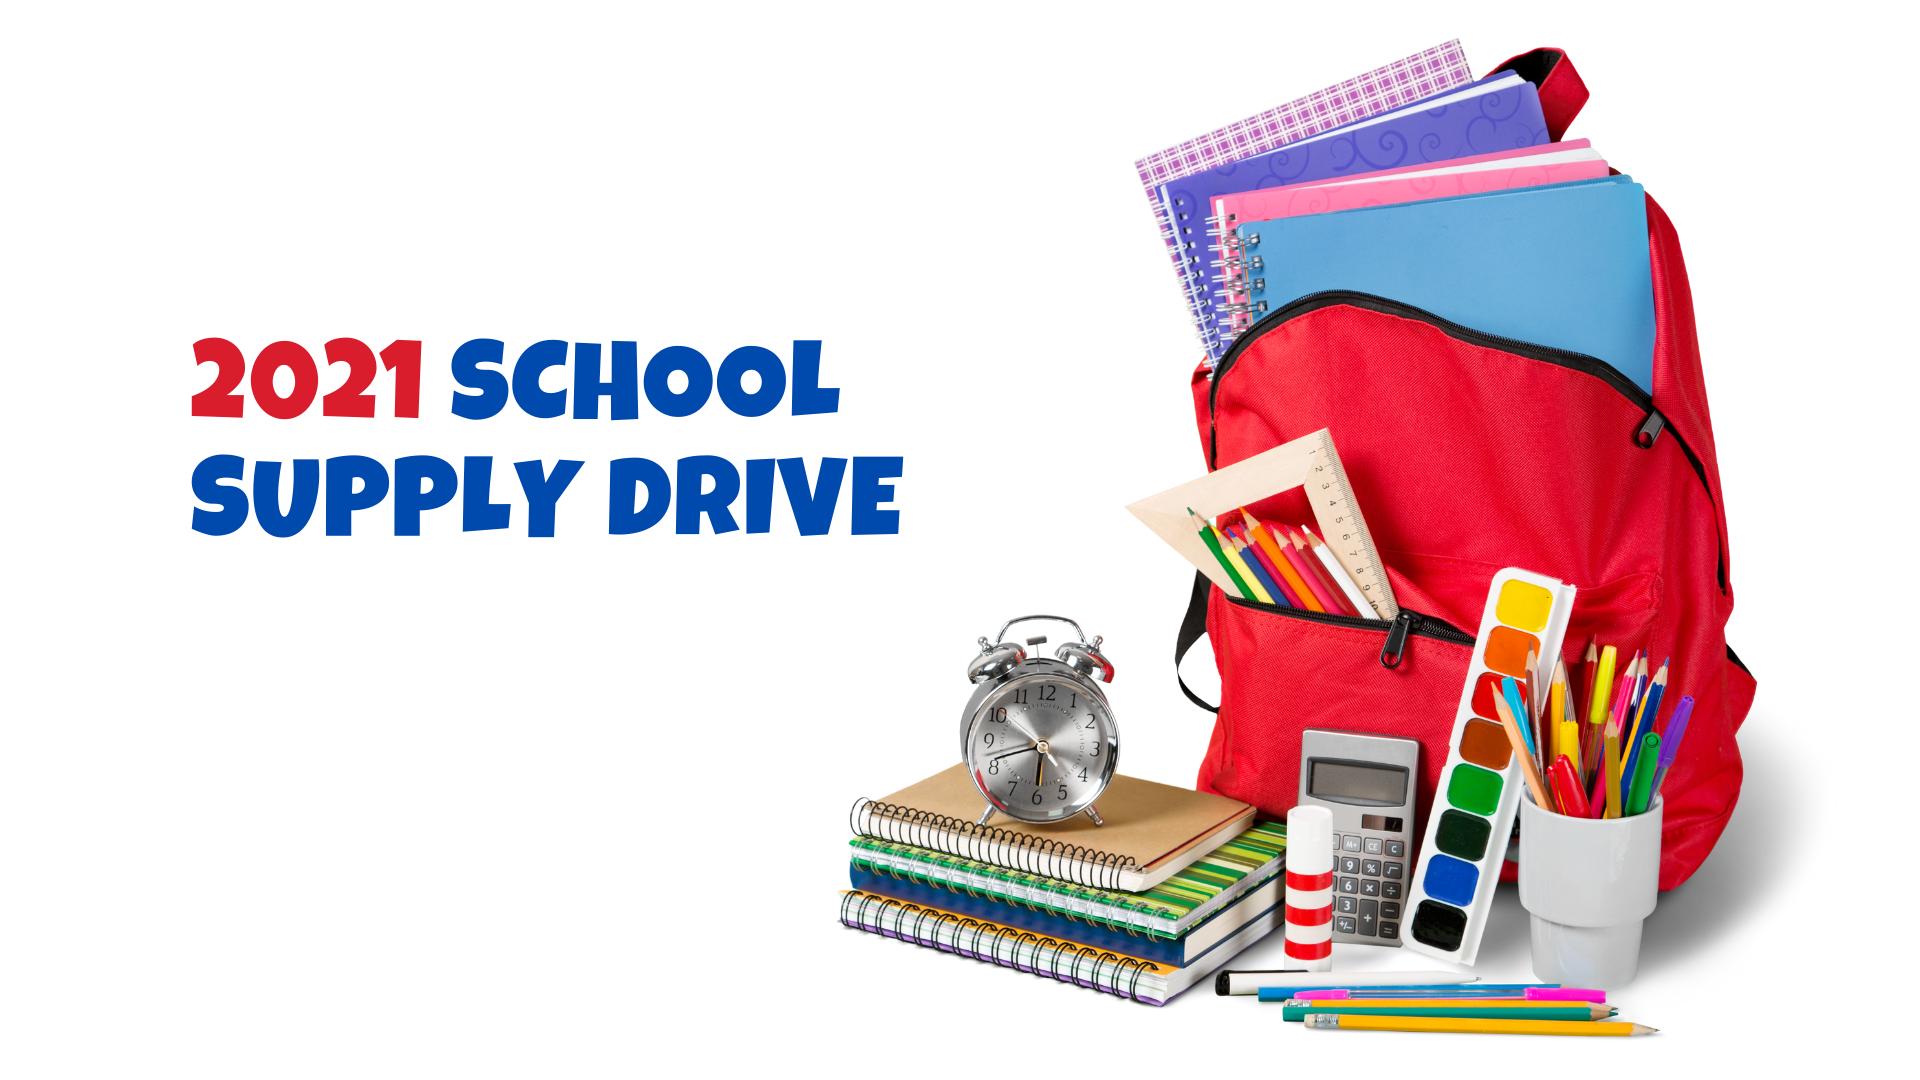 2021 School Supply Drive logo